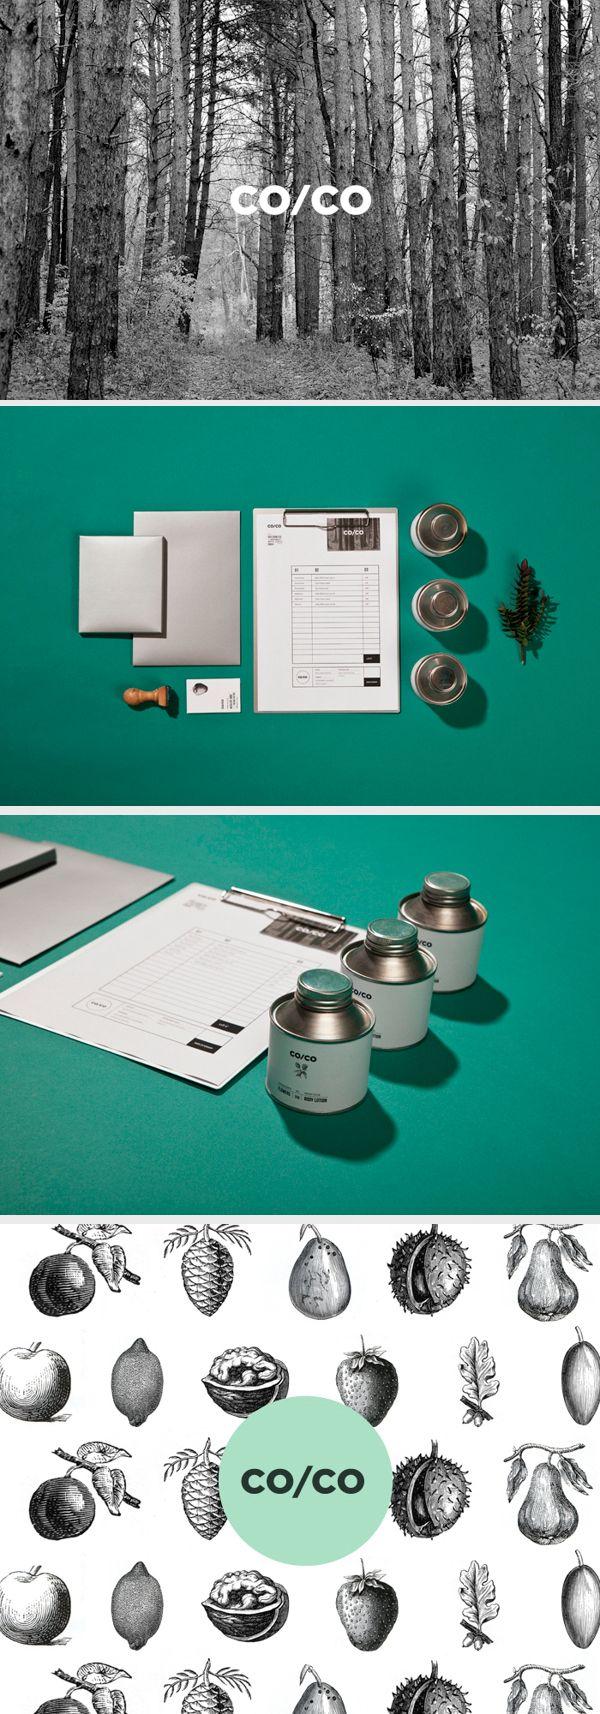 Kivat siemenkuvat! branding / CO/CO cosmetics | #stationary #corporate #design #corporatedesign #identity #branding #marketing < repinned by www.BlickeDeeler.de | Take a look at www.LogoGestaltung-Hamburg.de